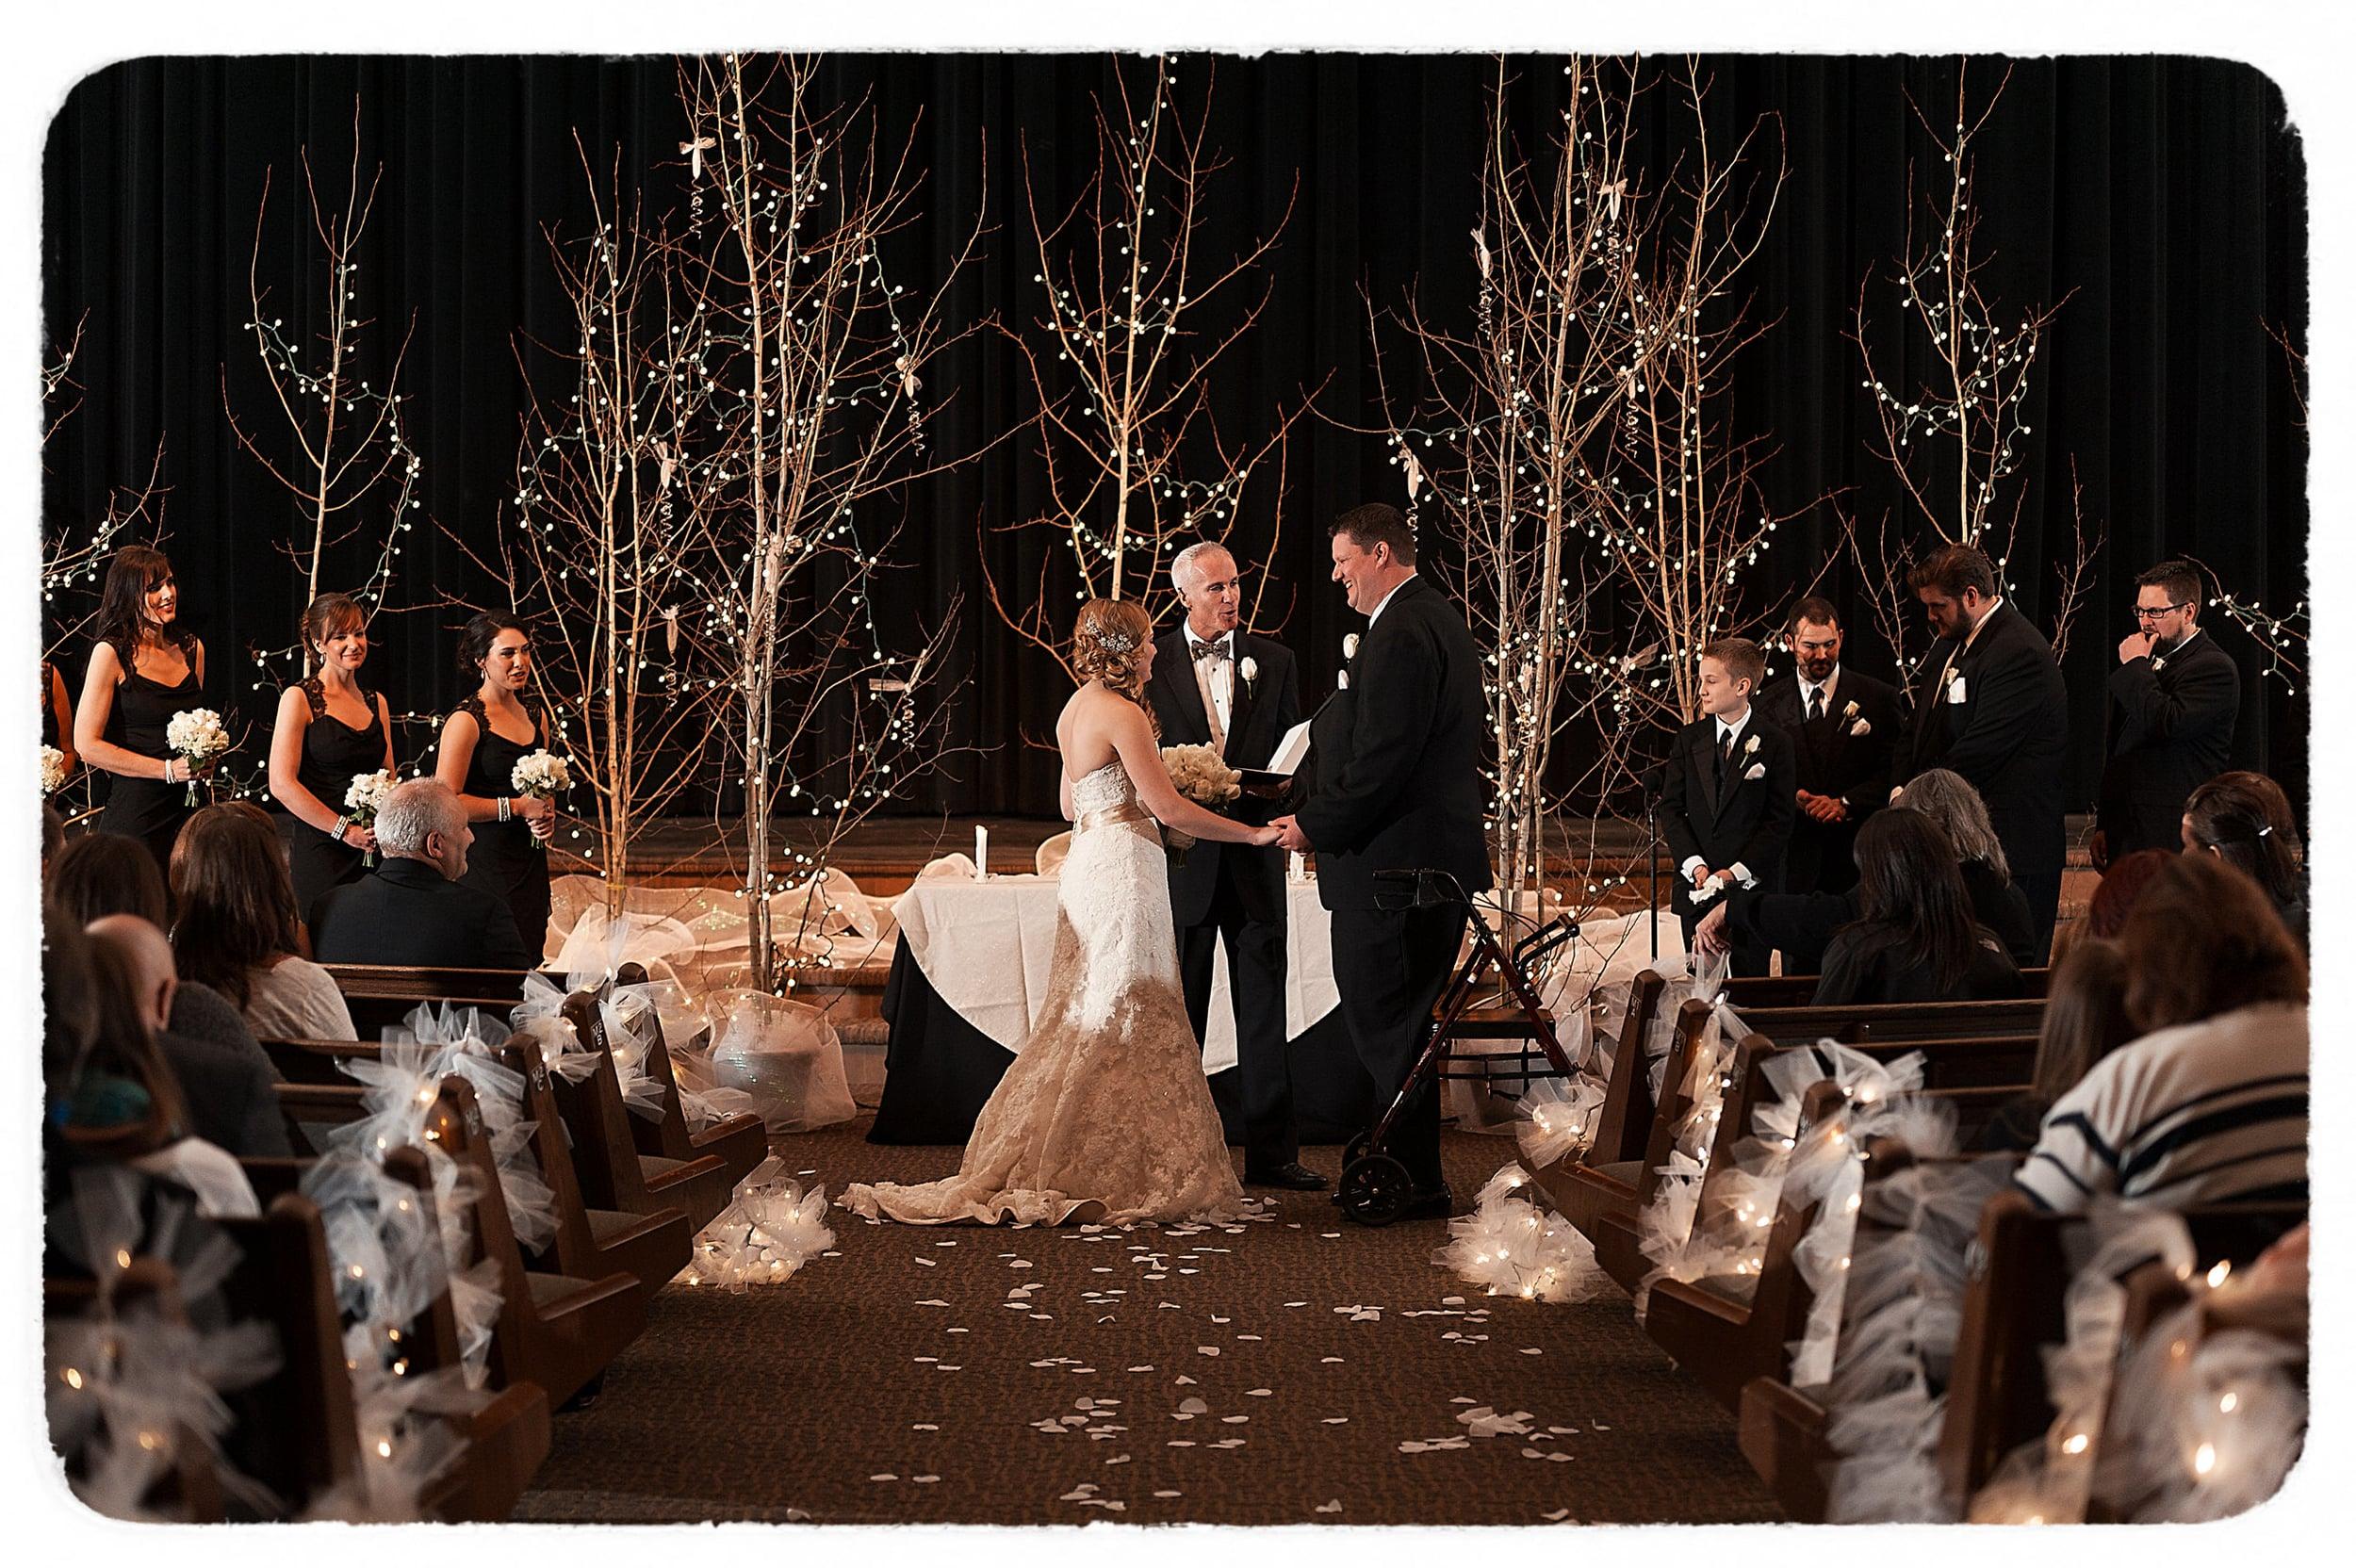 Jennifer & Patrick - Ceremony - 083Film.jpg